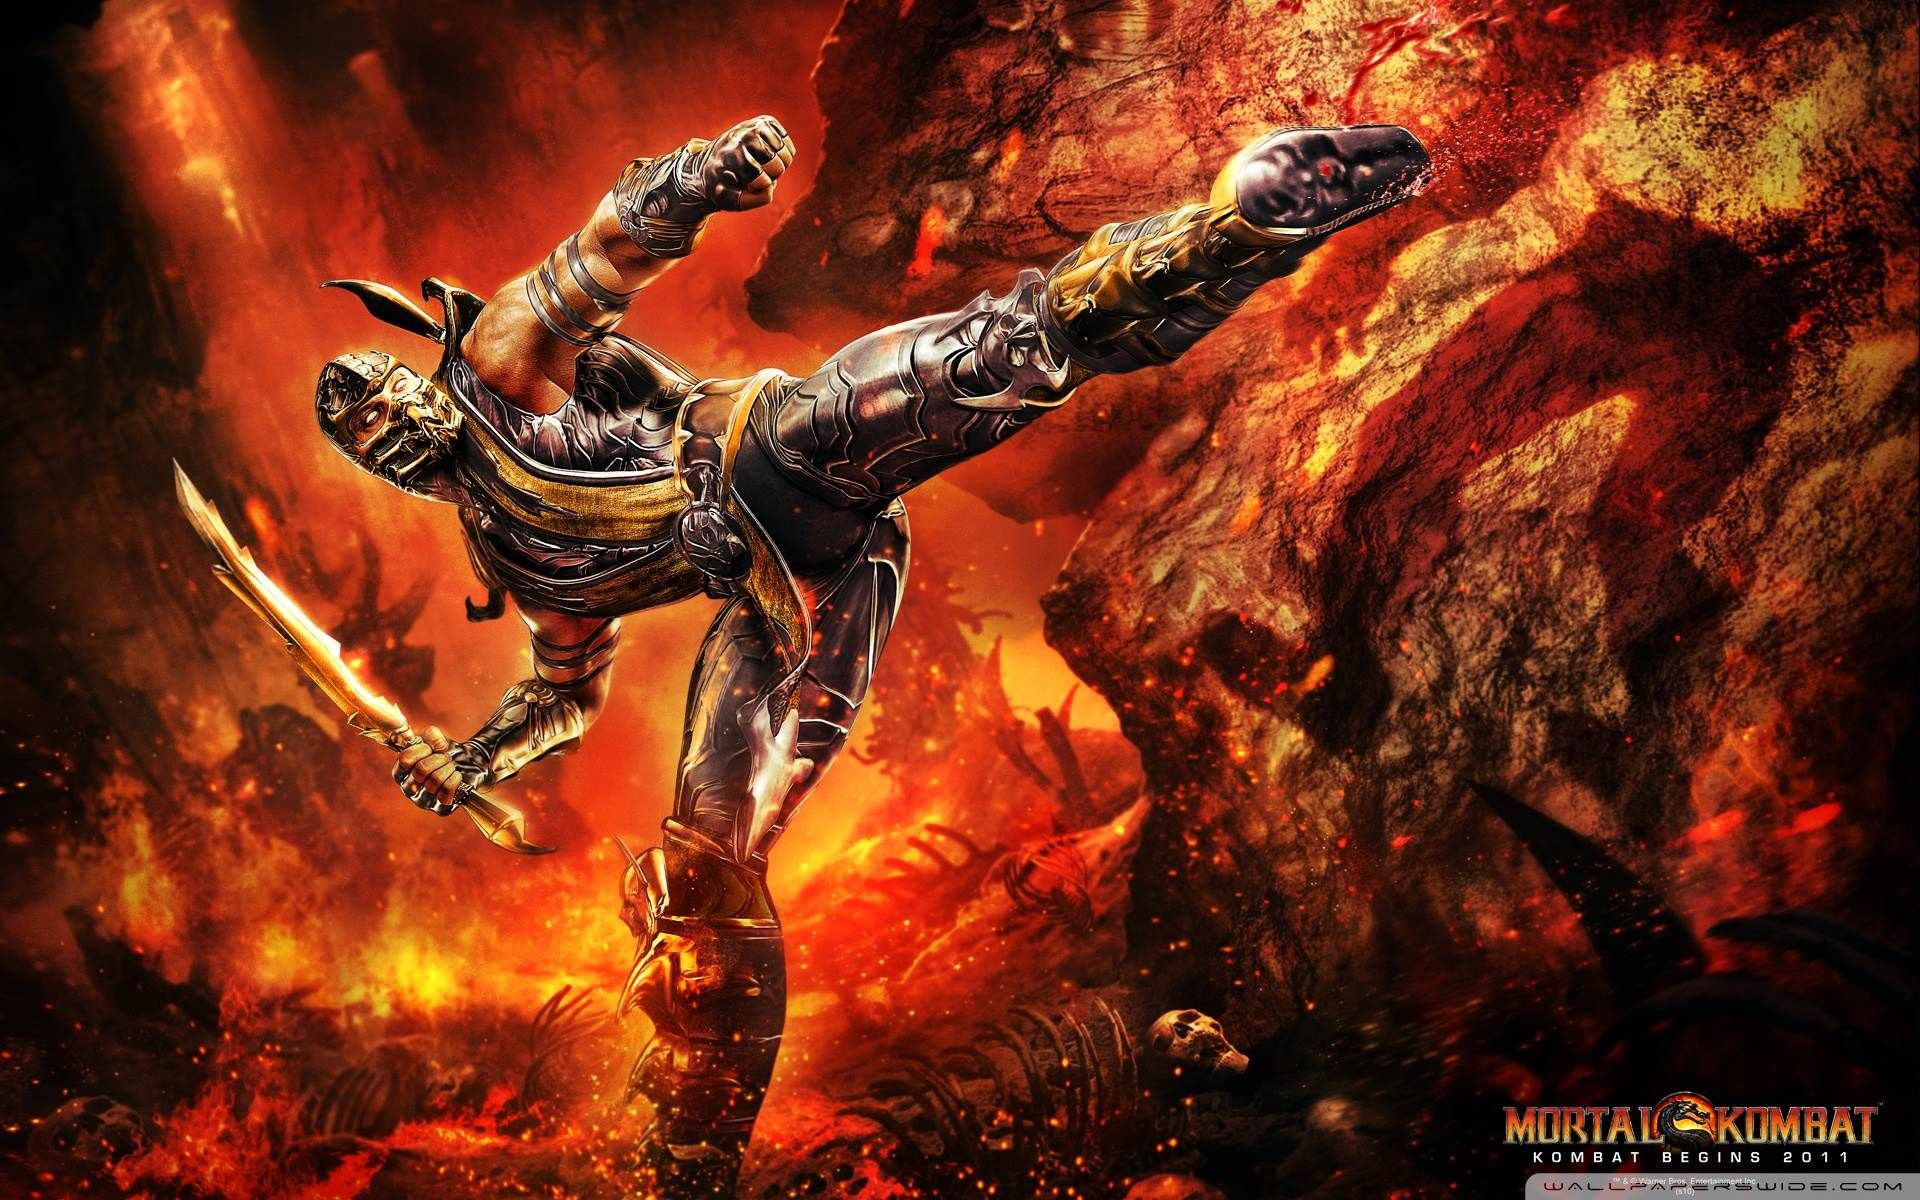 Mortal Kombat Wallpapers Collection  1920×1200 Imagenes De Mortal Kombat 9 | Adorable Wallpapers